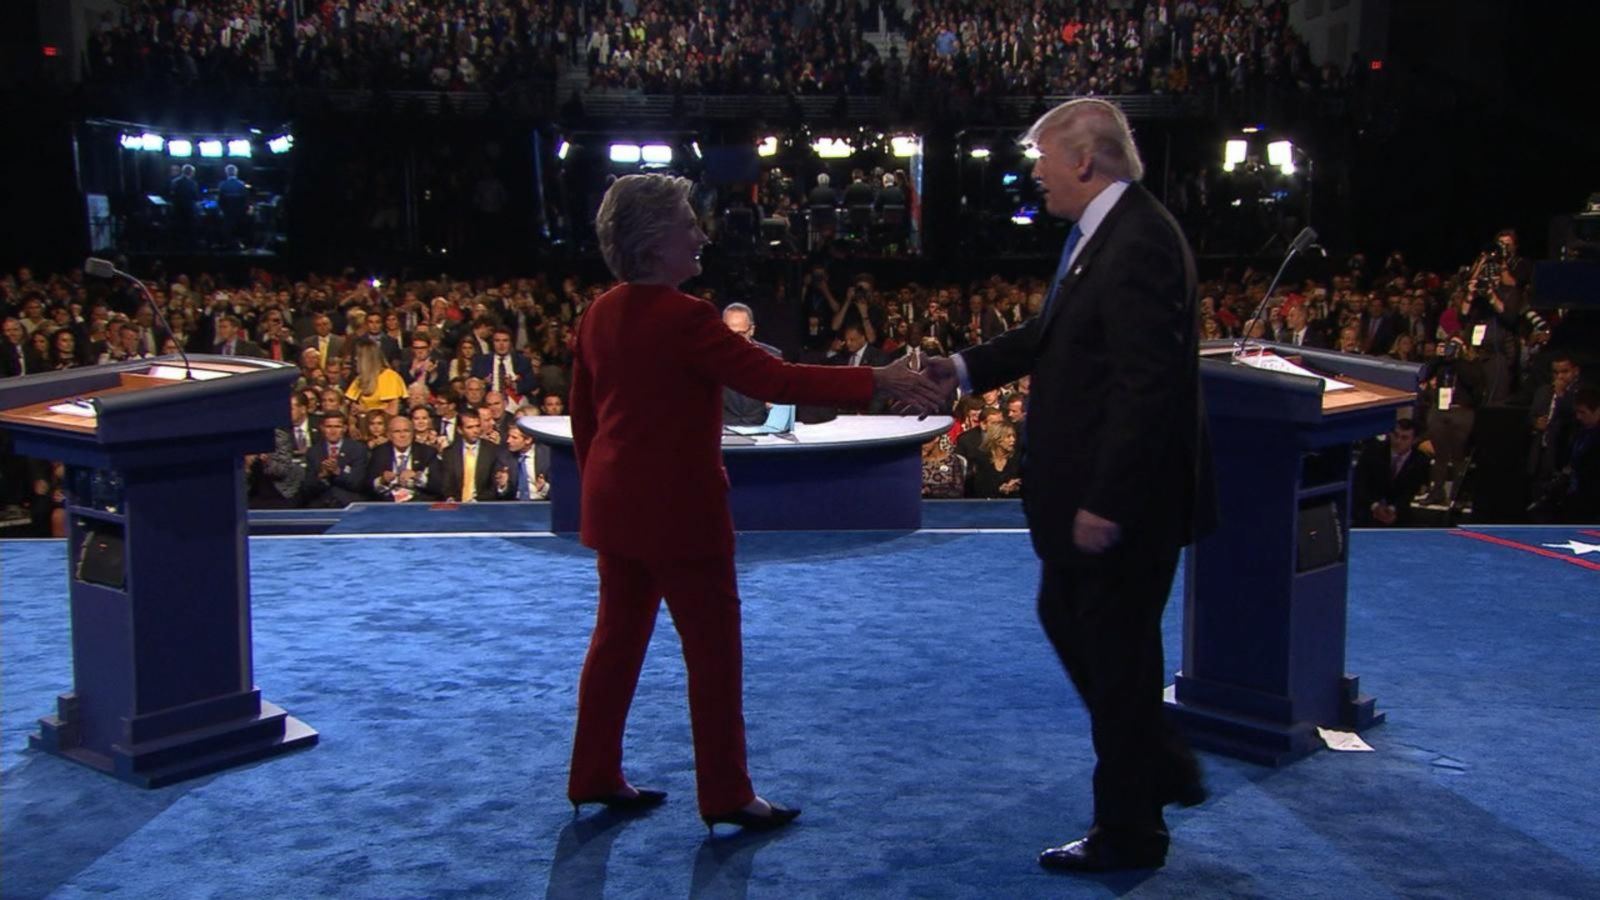 VIDEO: ABC News' Political Analysis Fact Check the Presidential Debate